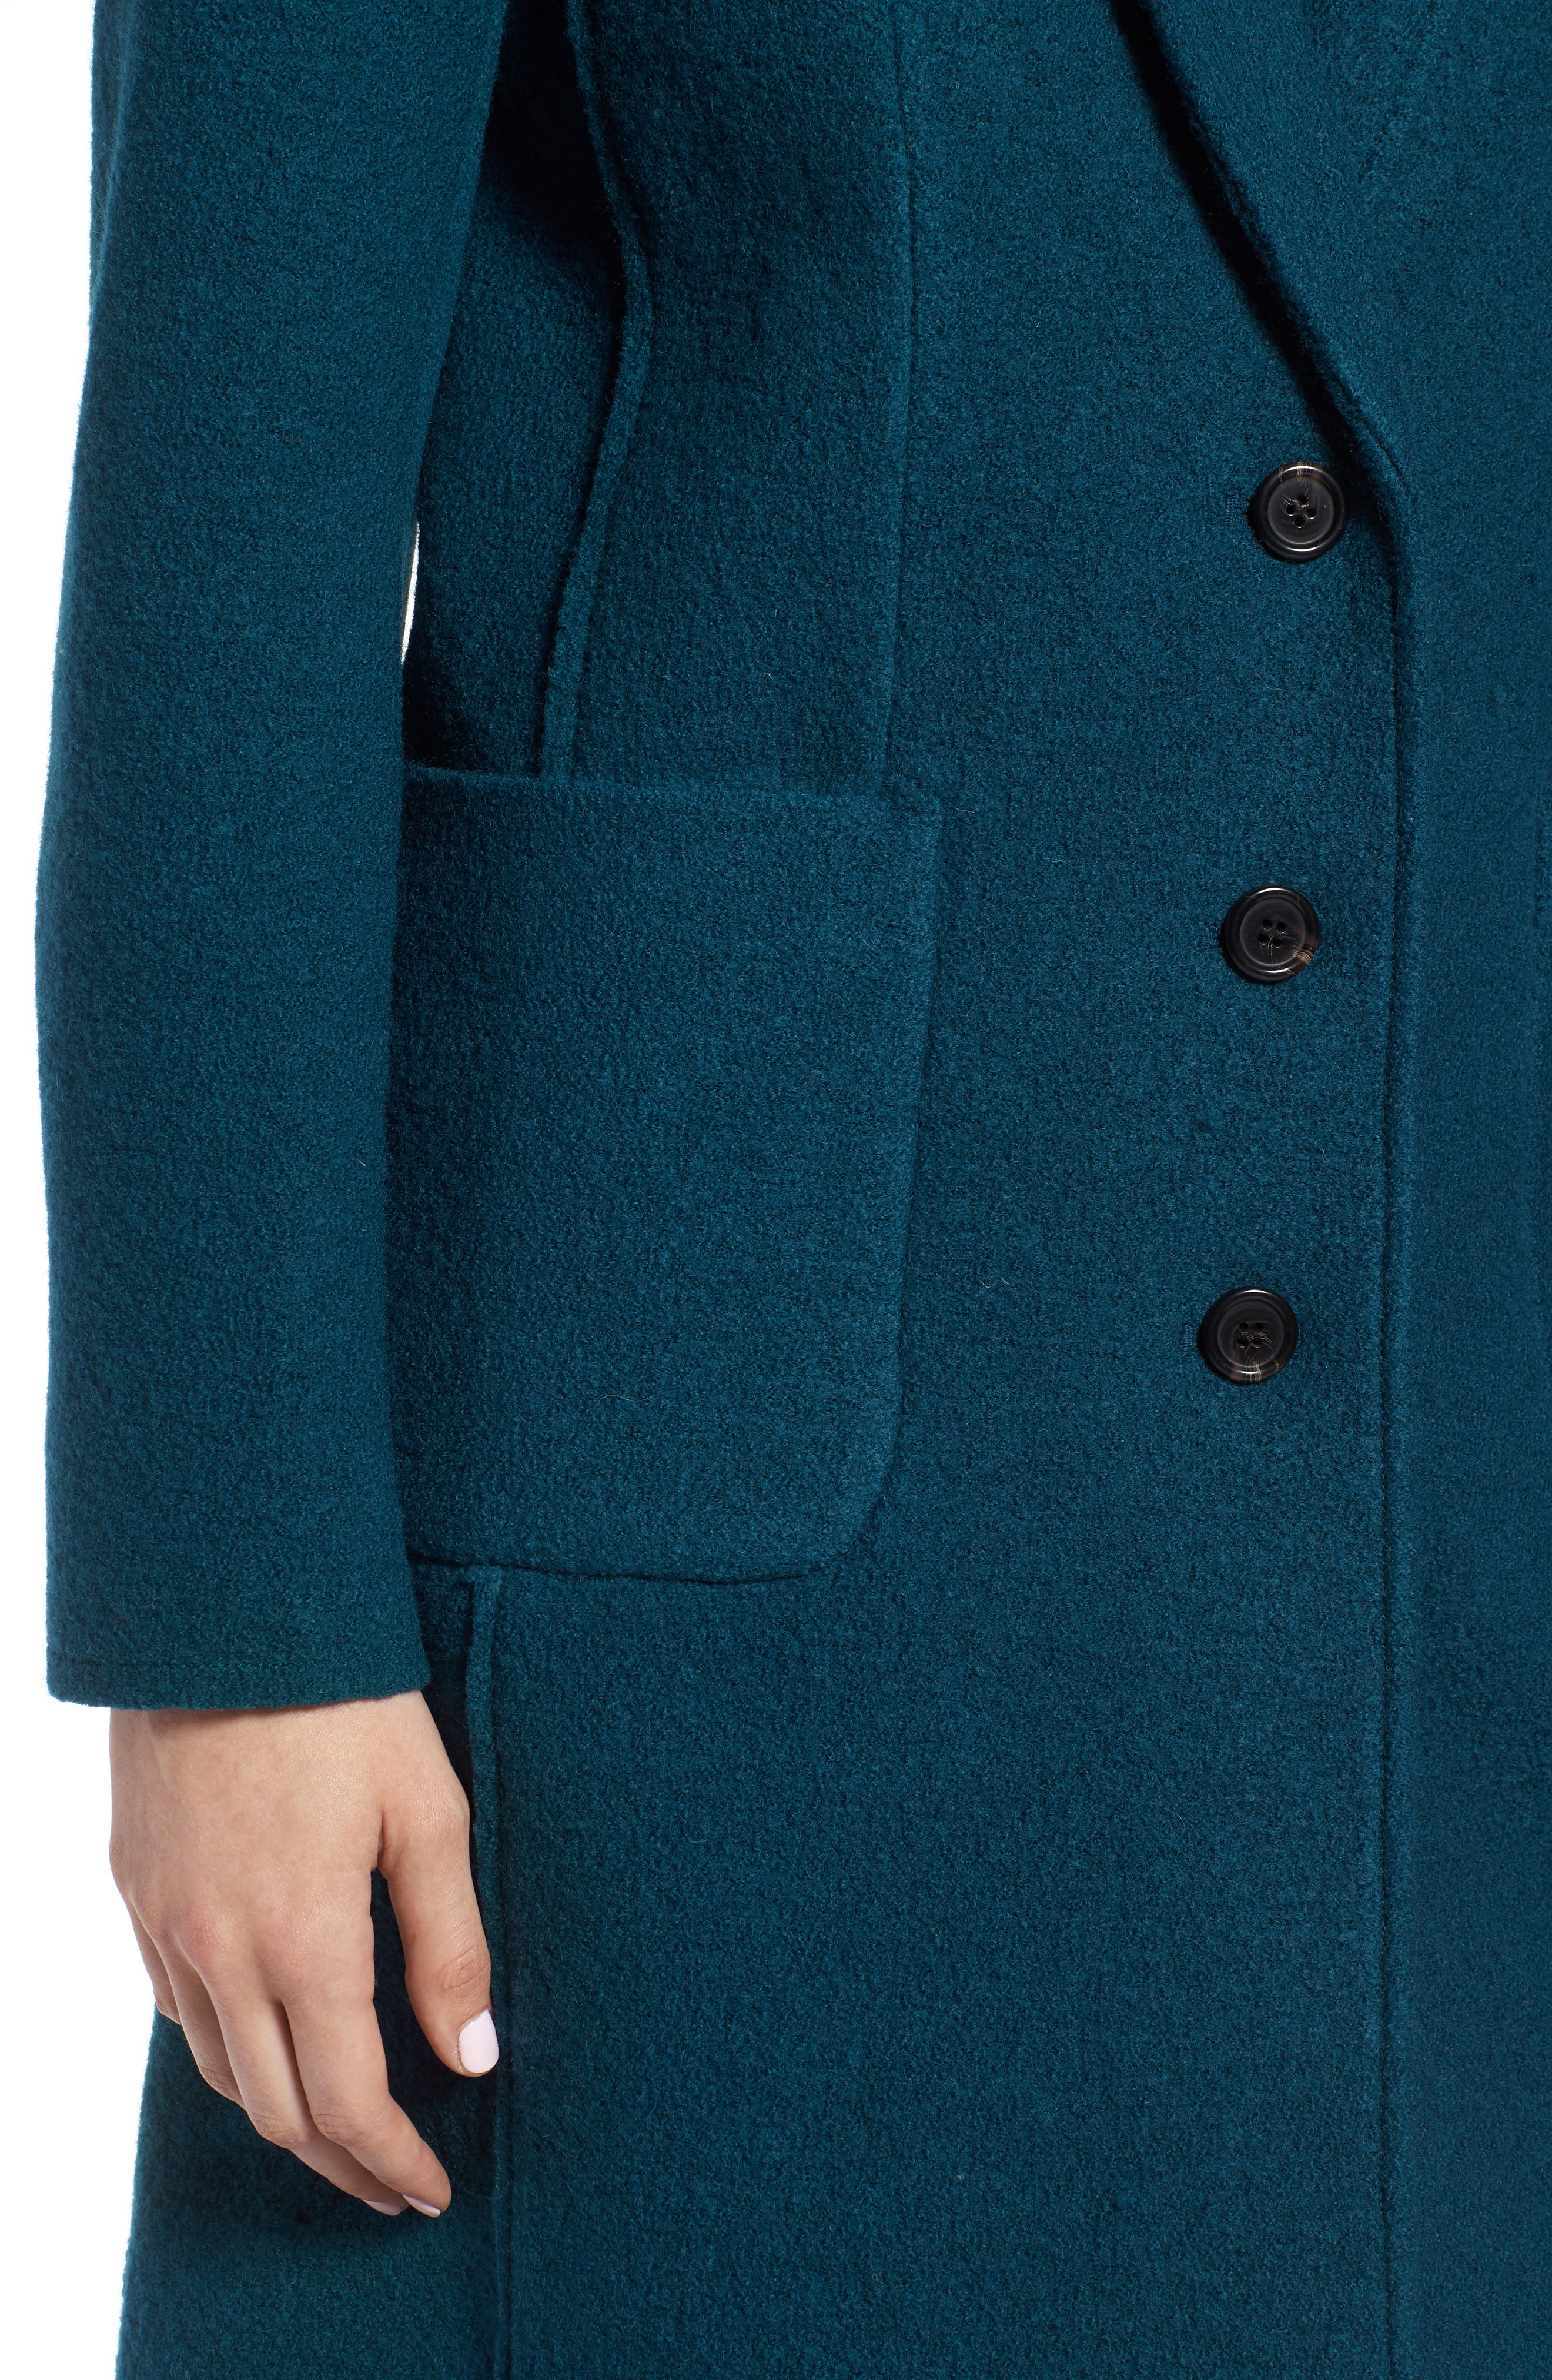 Olga Boiled Wool Topcoat,                             Alternate thumbnail 4, color,                             Winter Pine